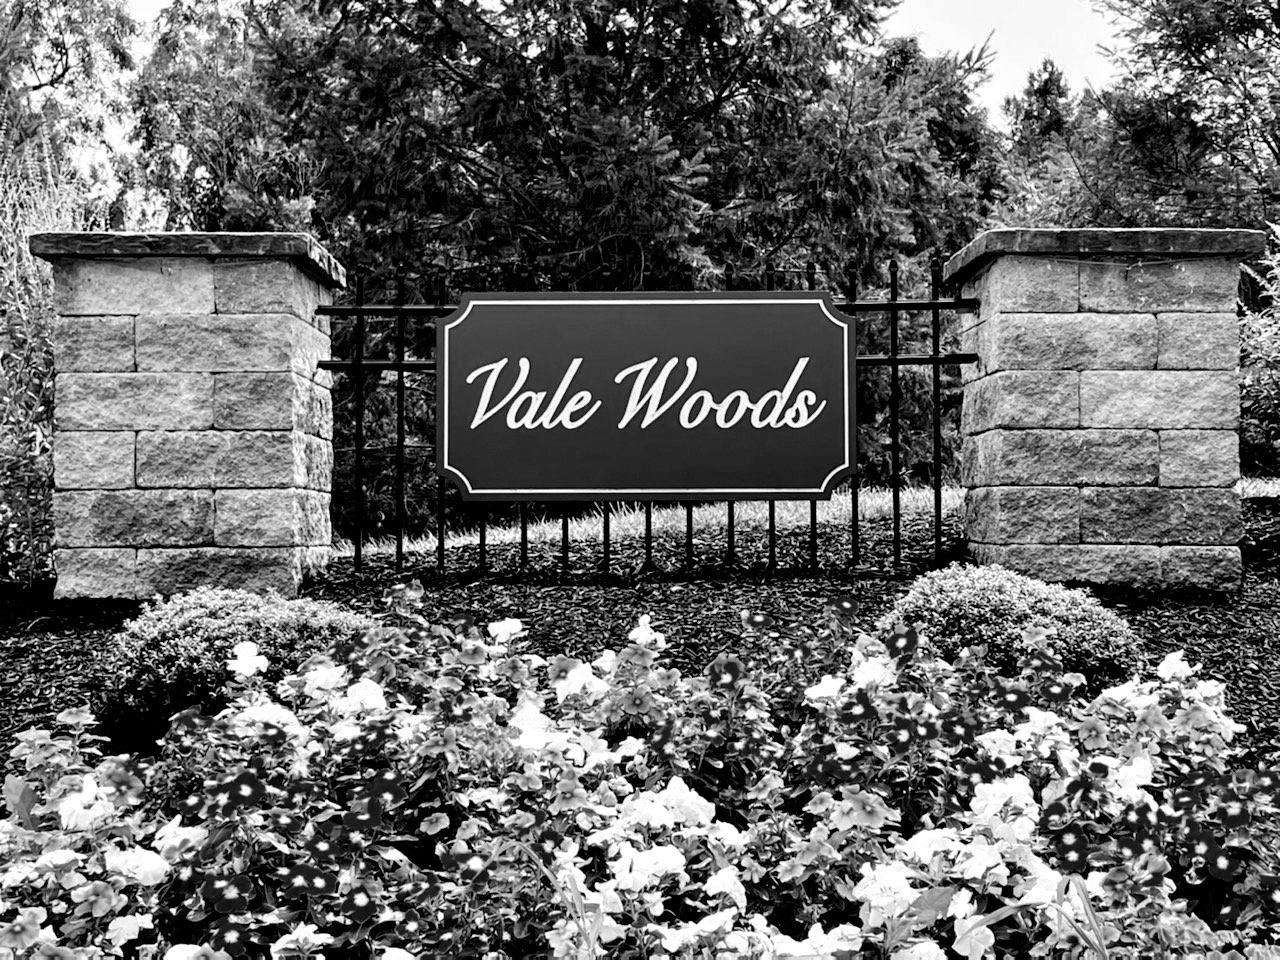 Vale Woods